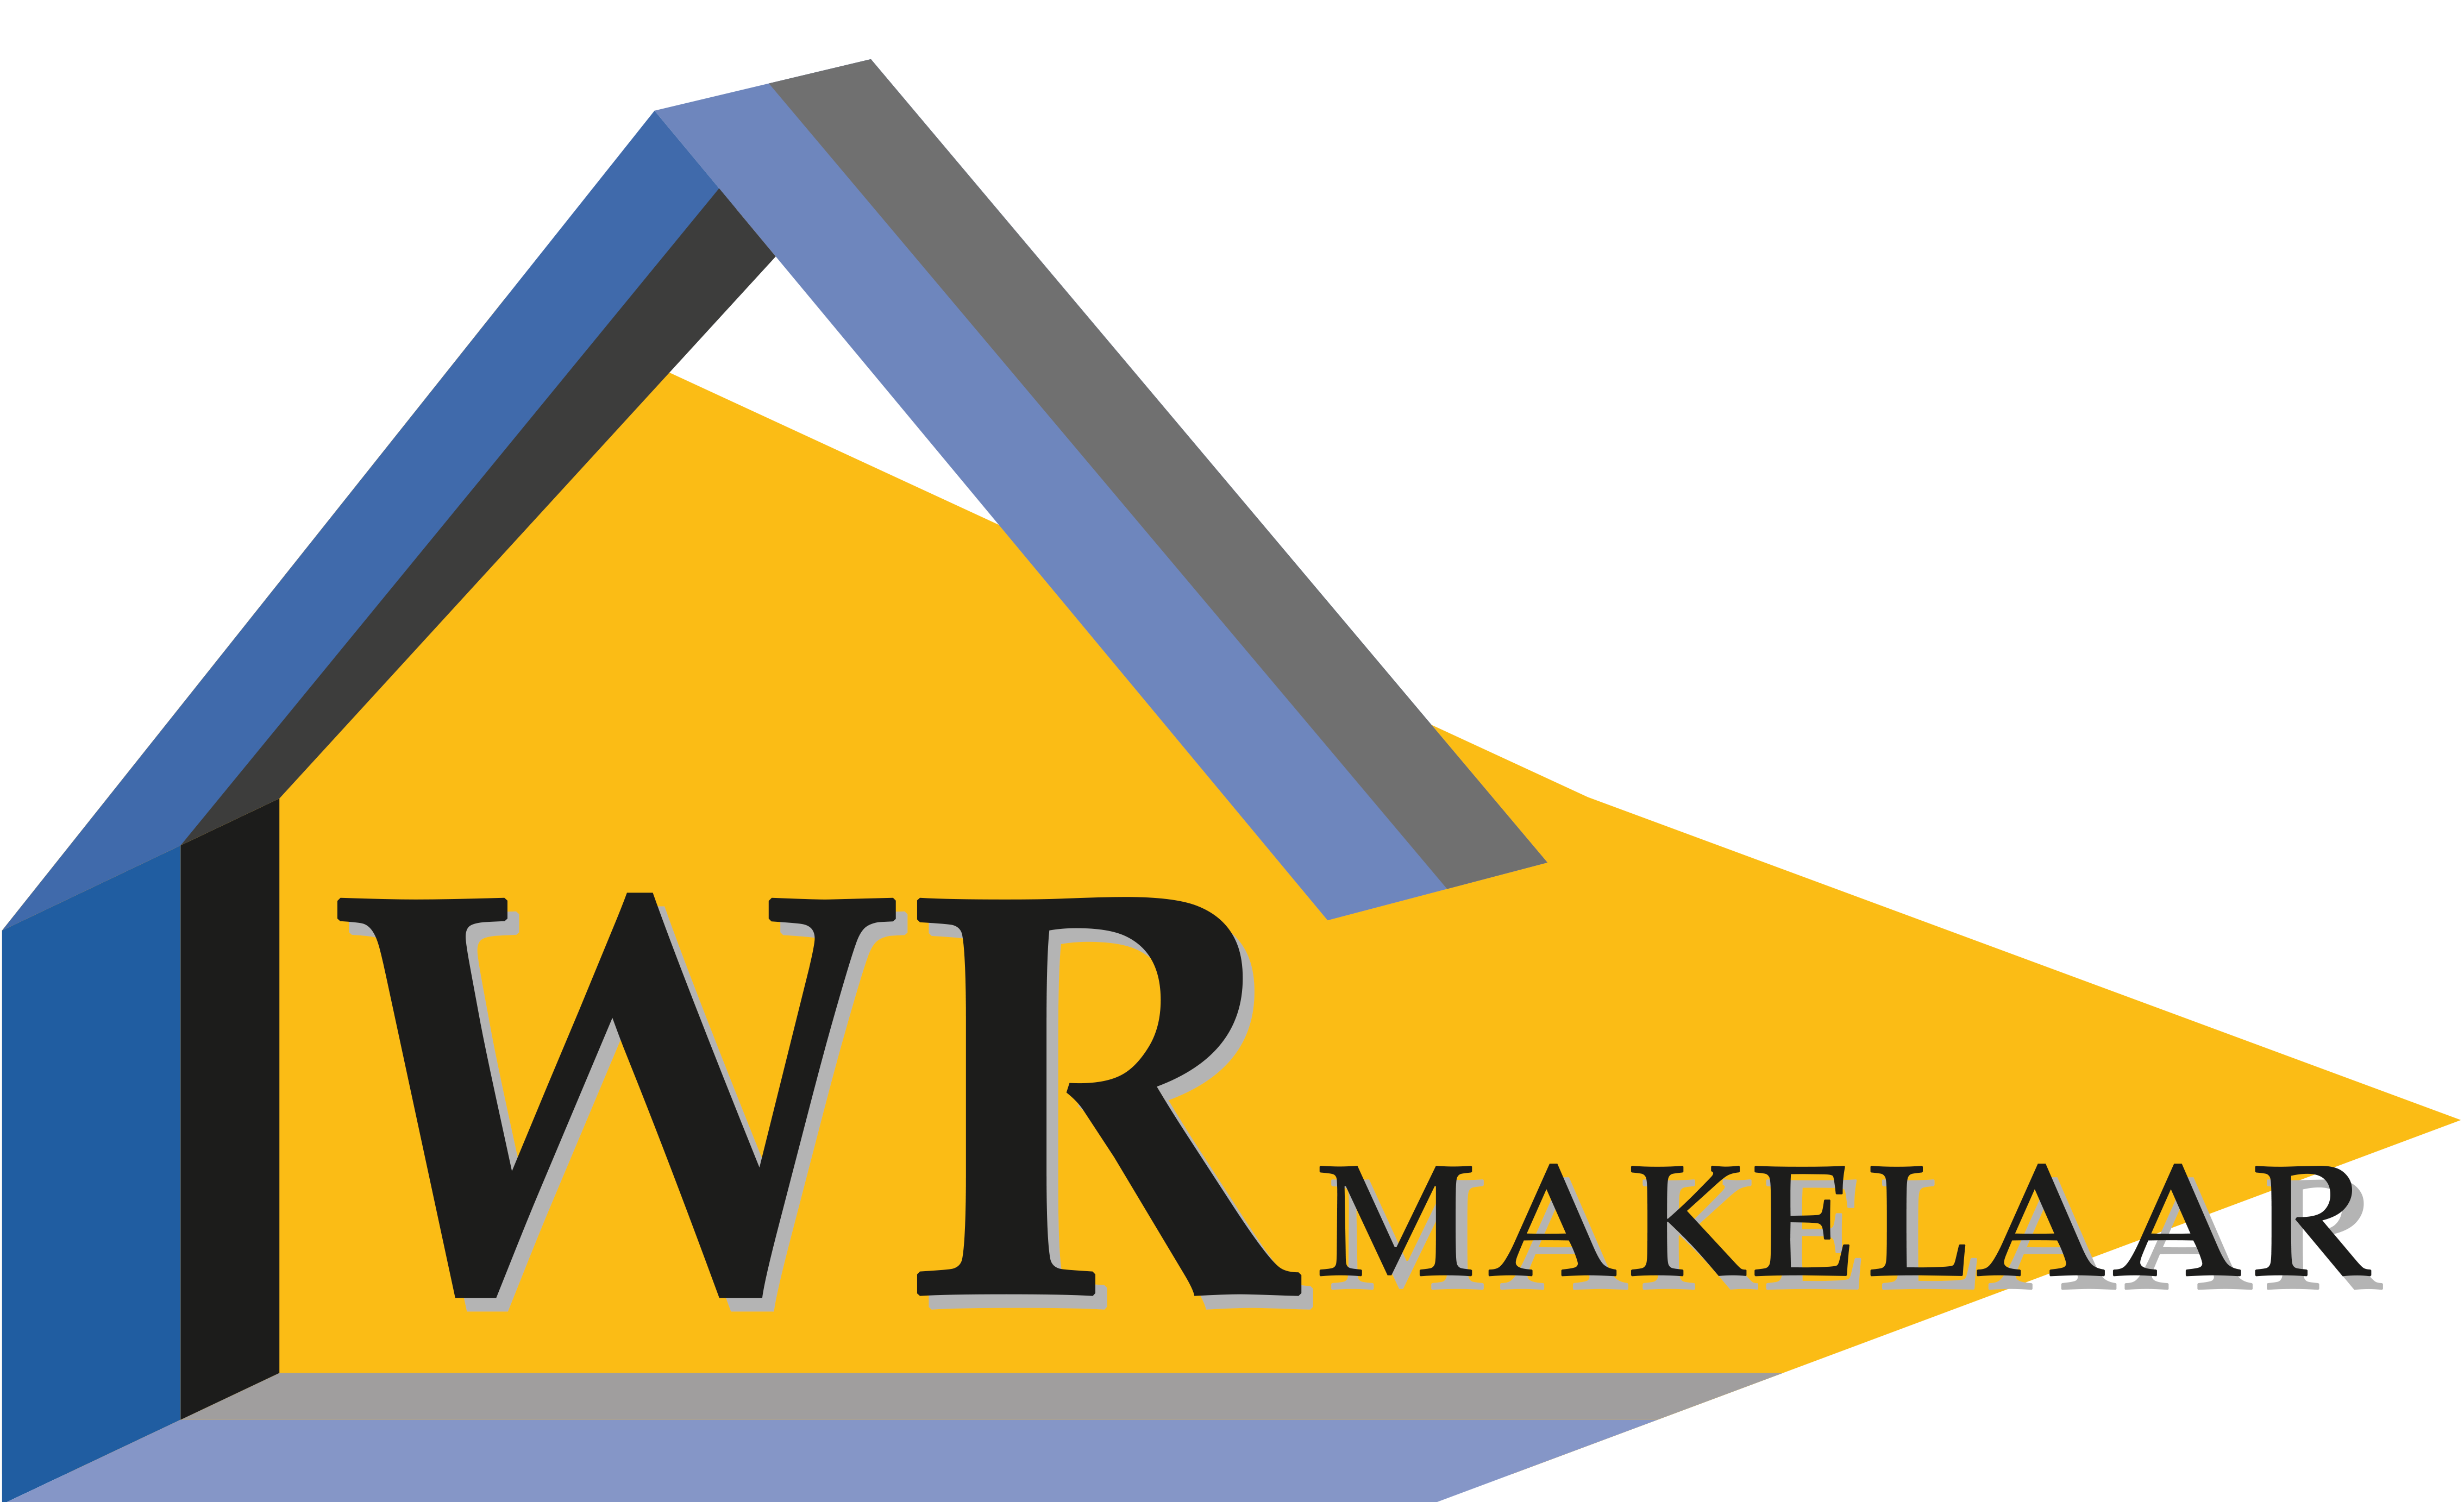 Logo WR Makelaar